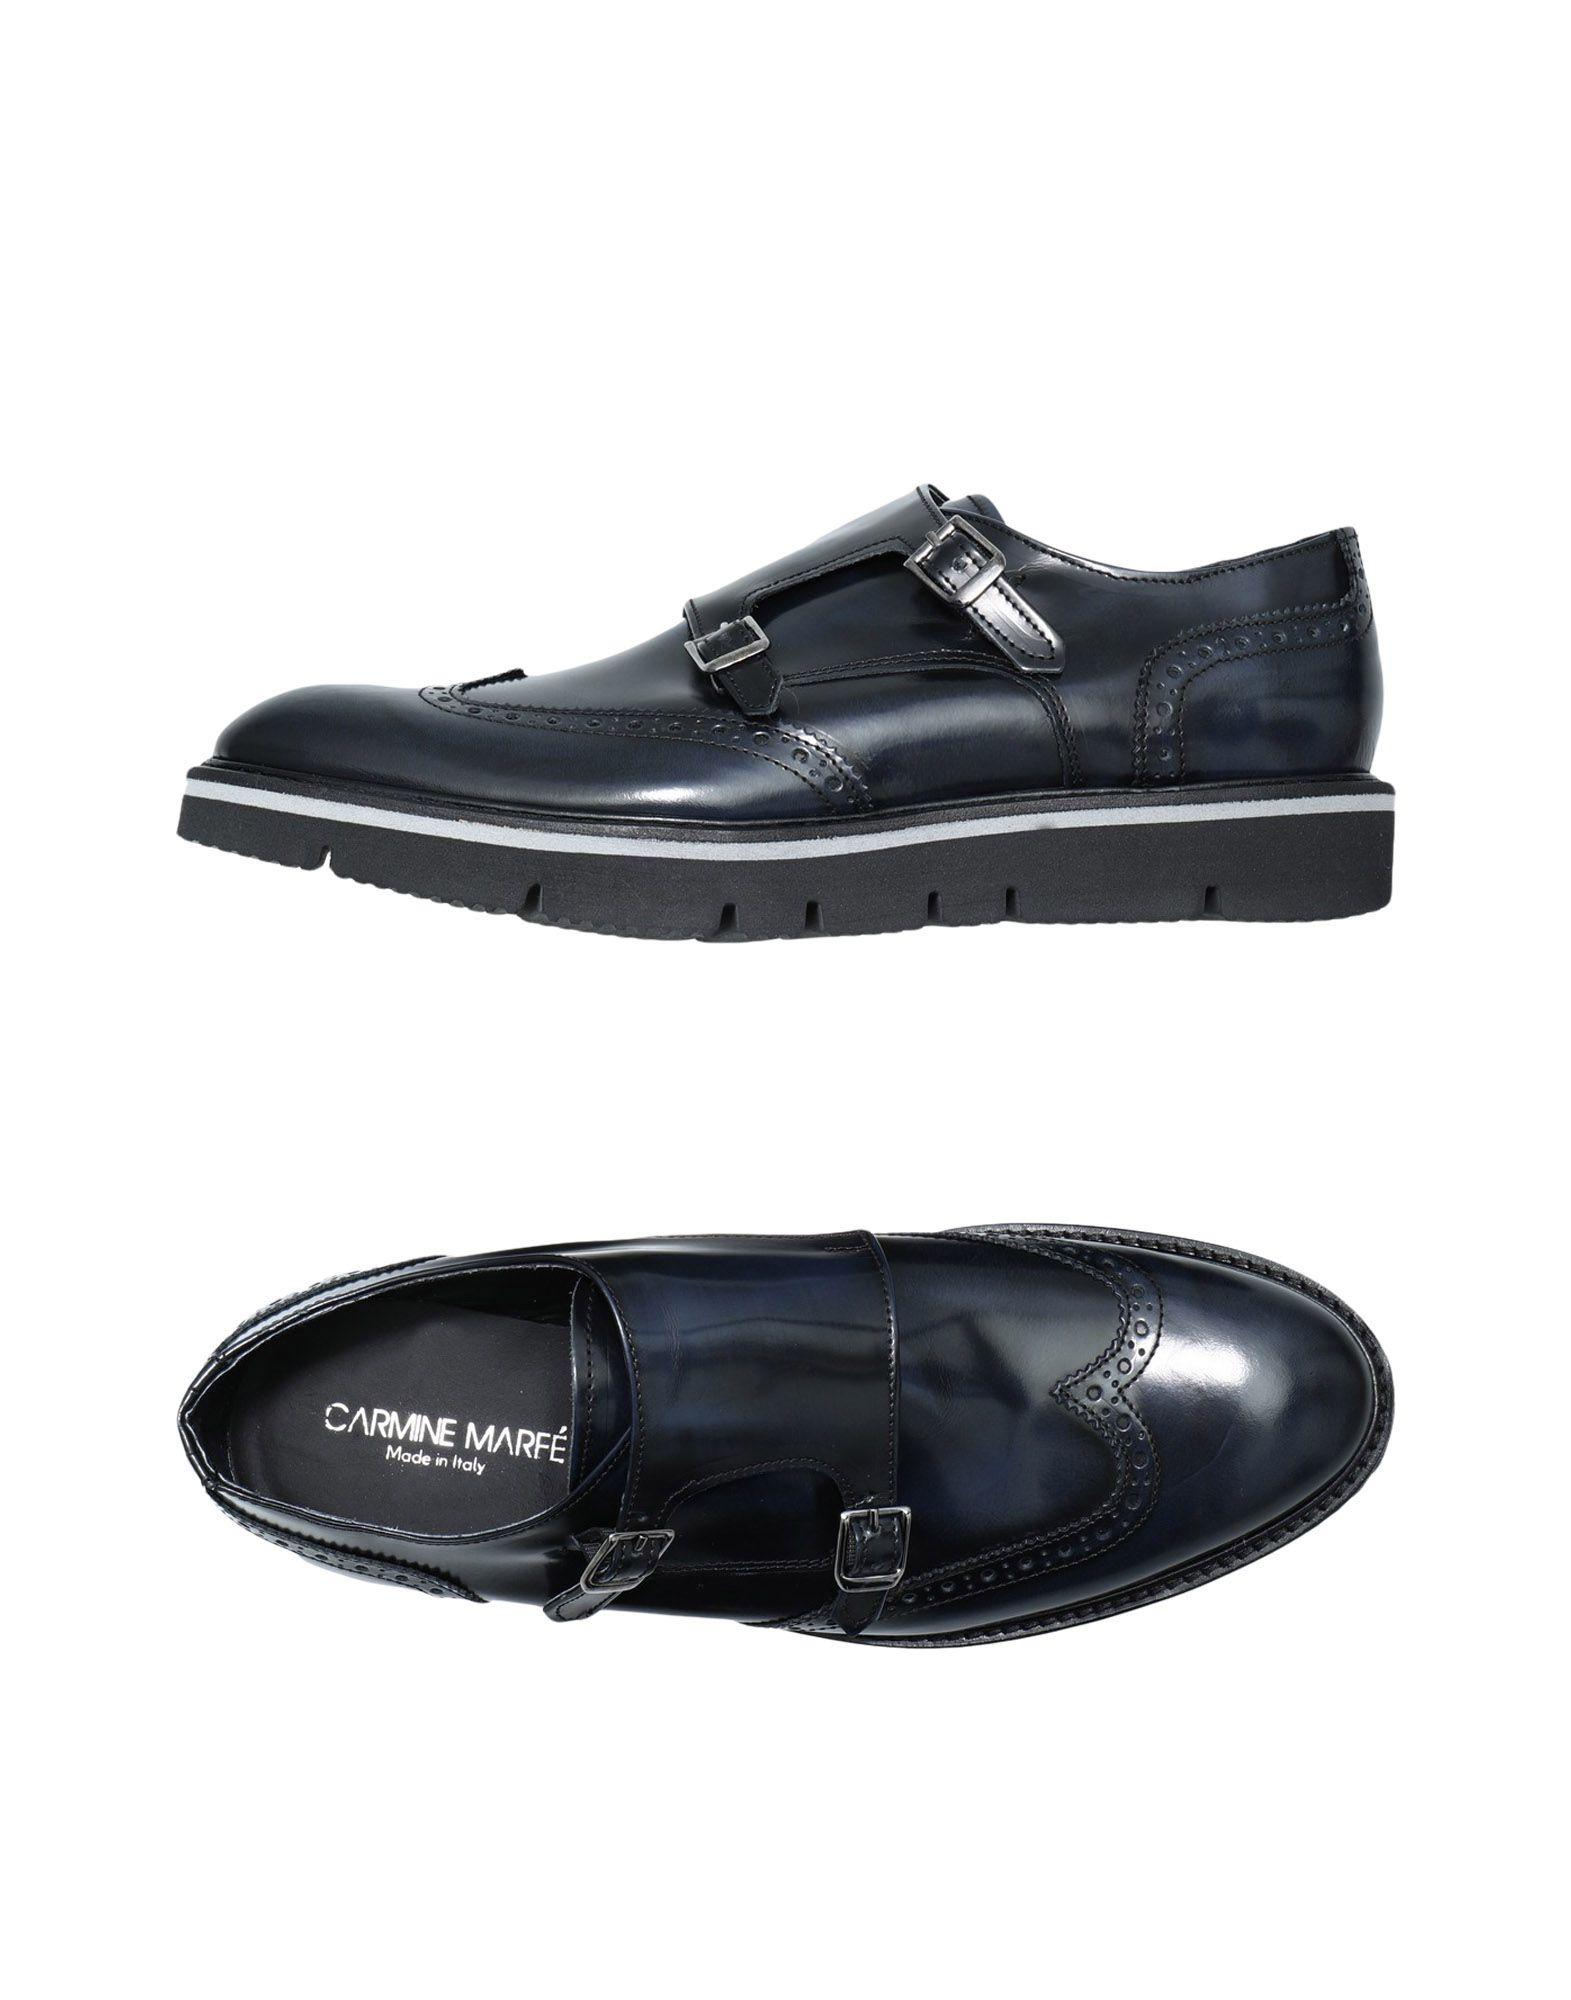 Carmine Marfé Mokassins Herren  11532796RJ Gute Qualität beliebte Schuhe